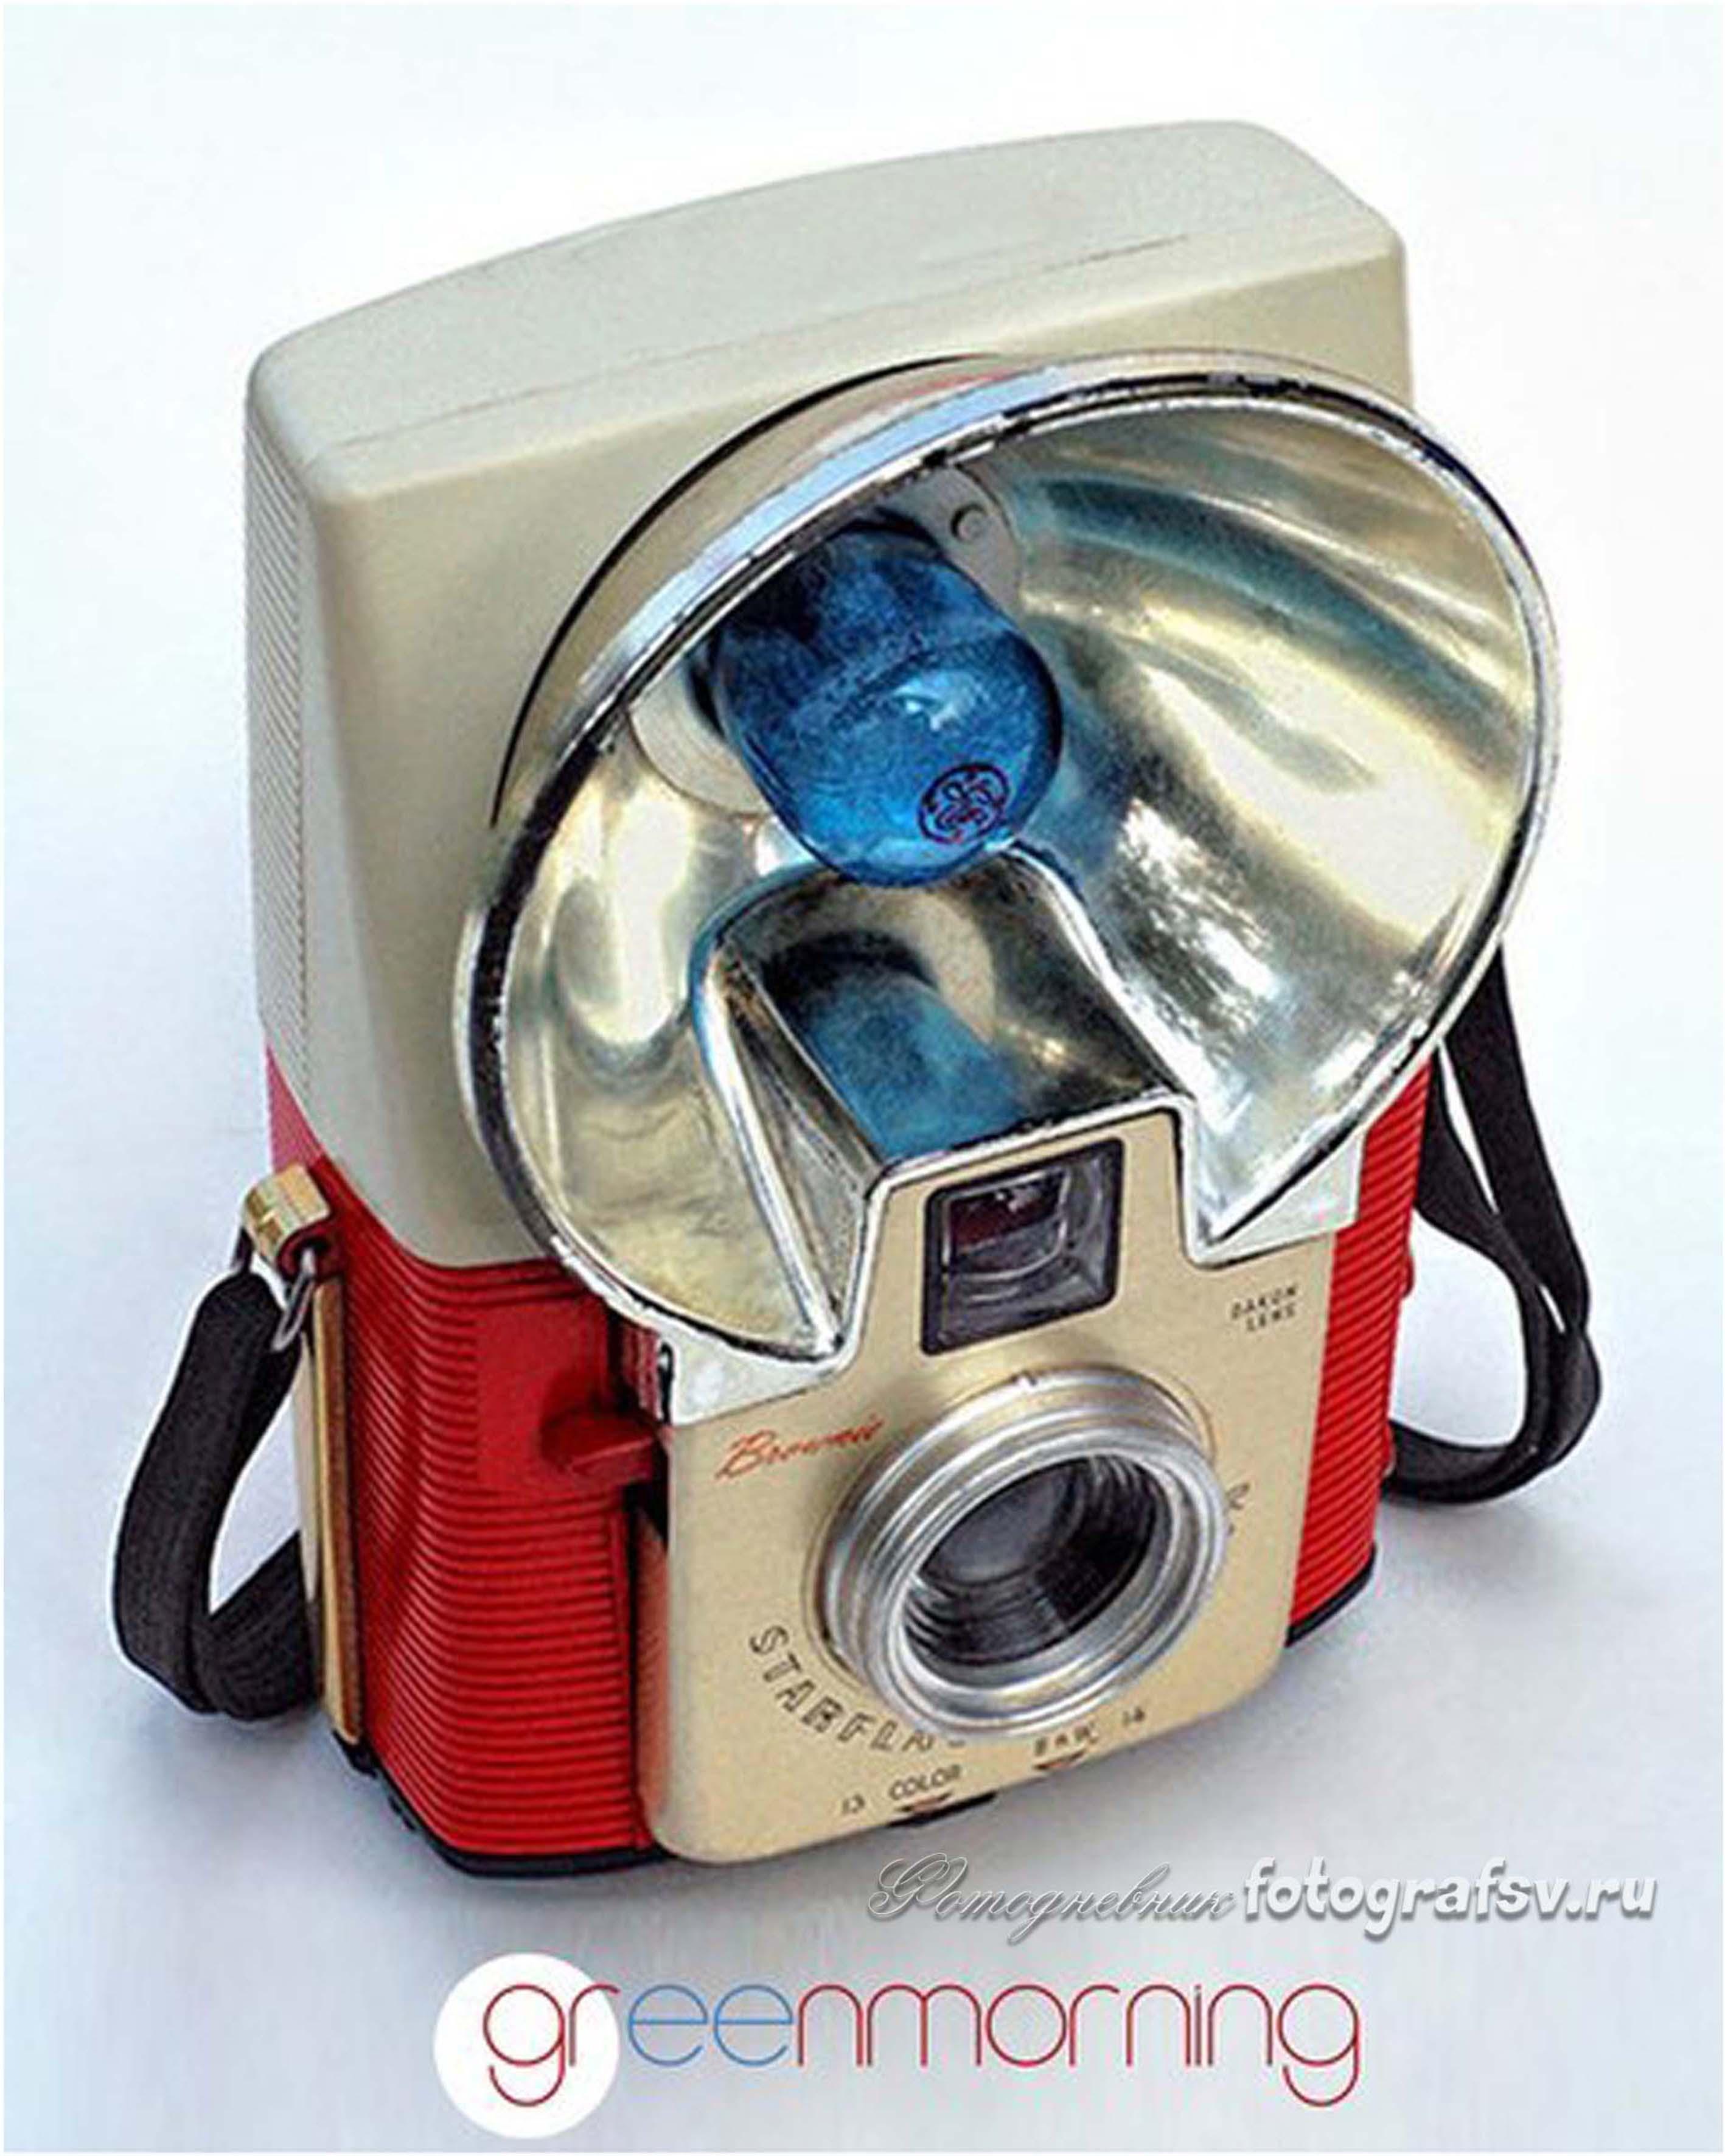 Фотодневник. Фотоаппарат Kodak Starflash.